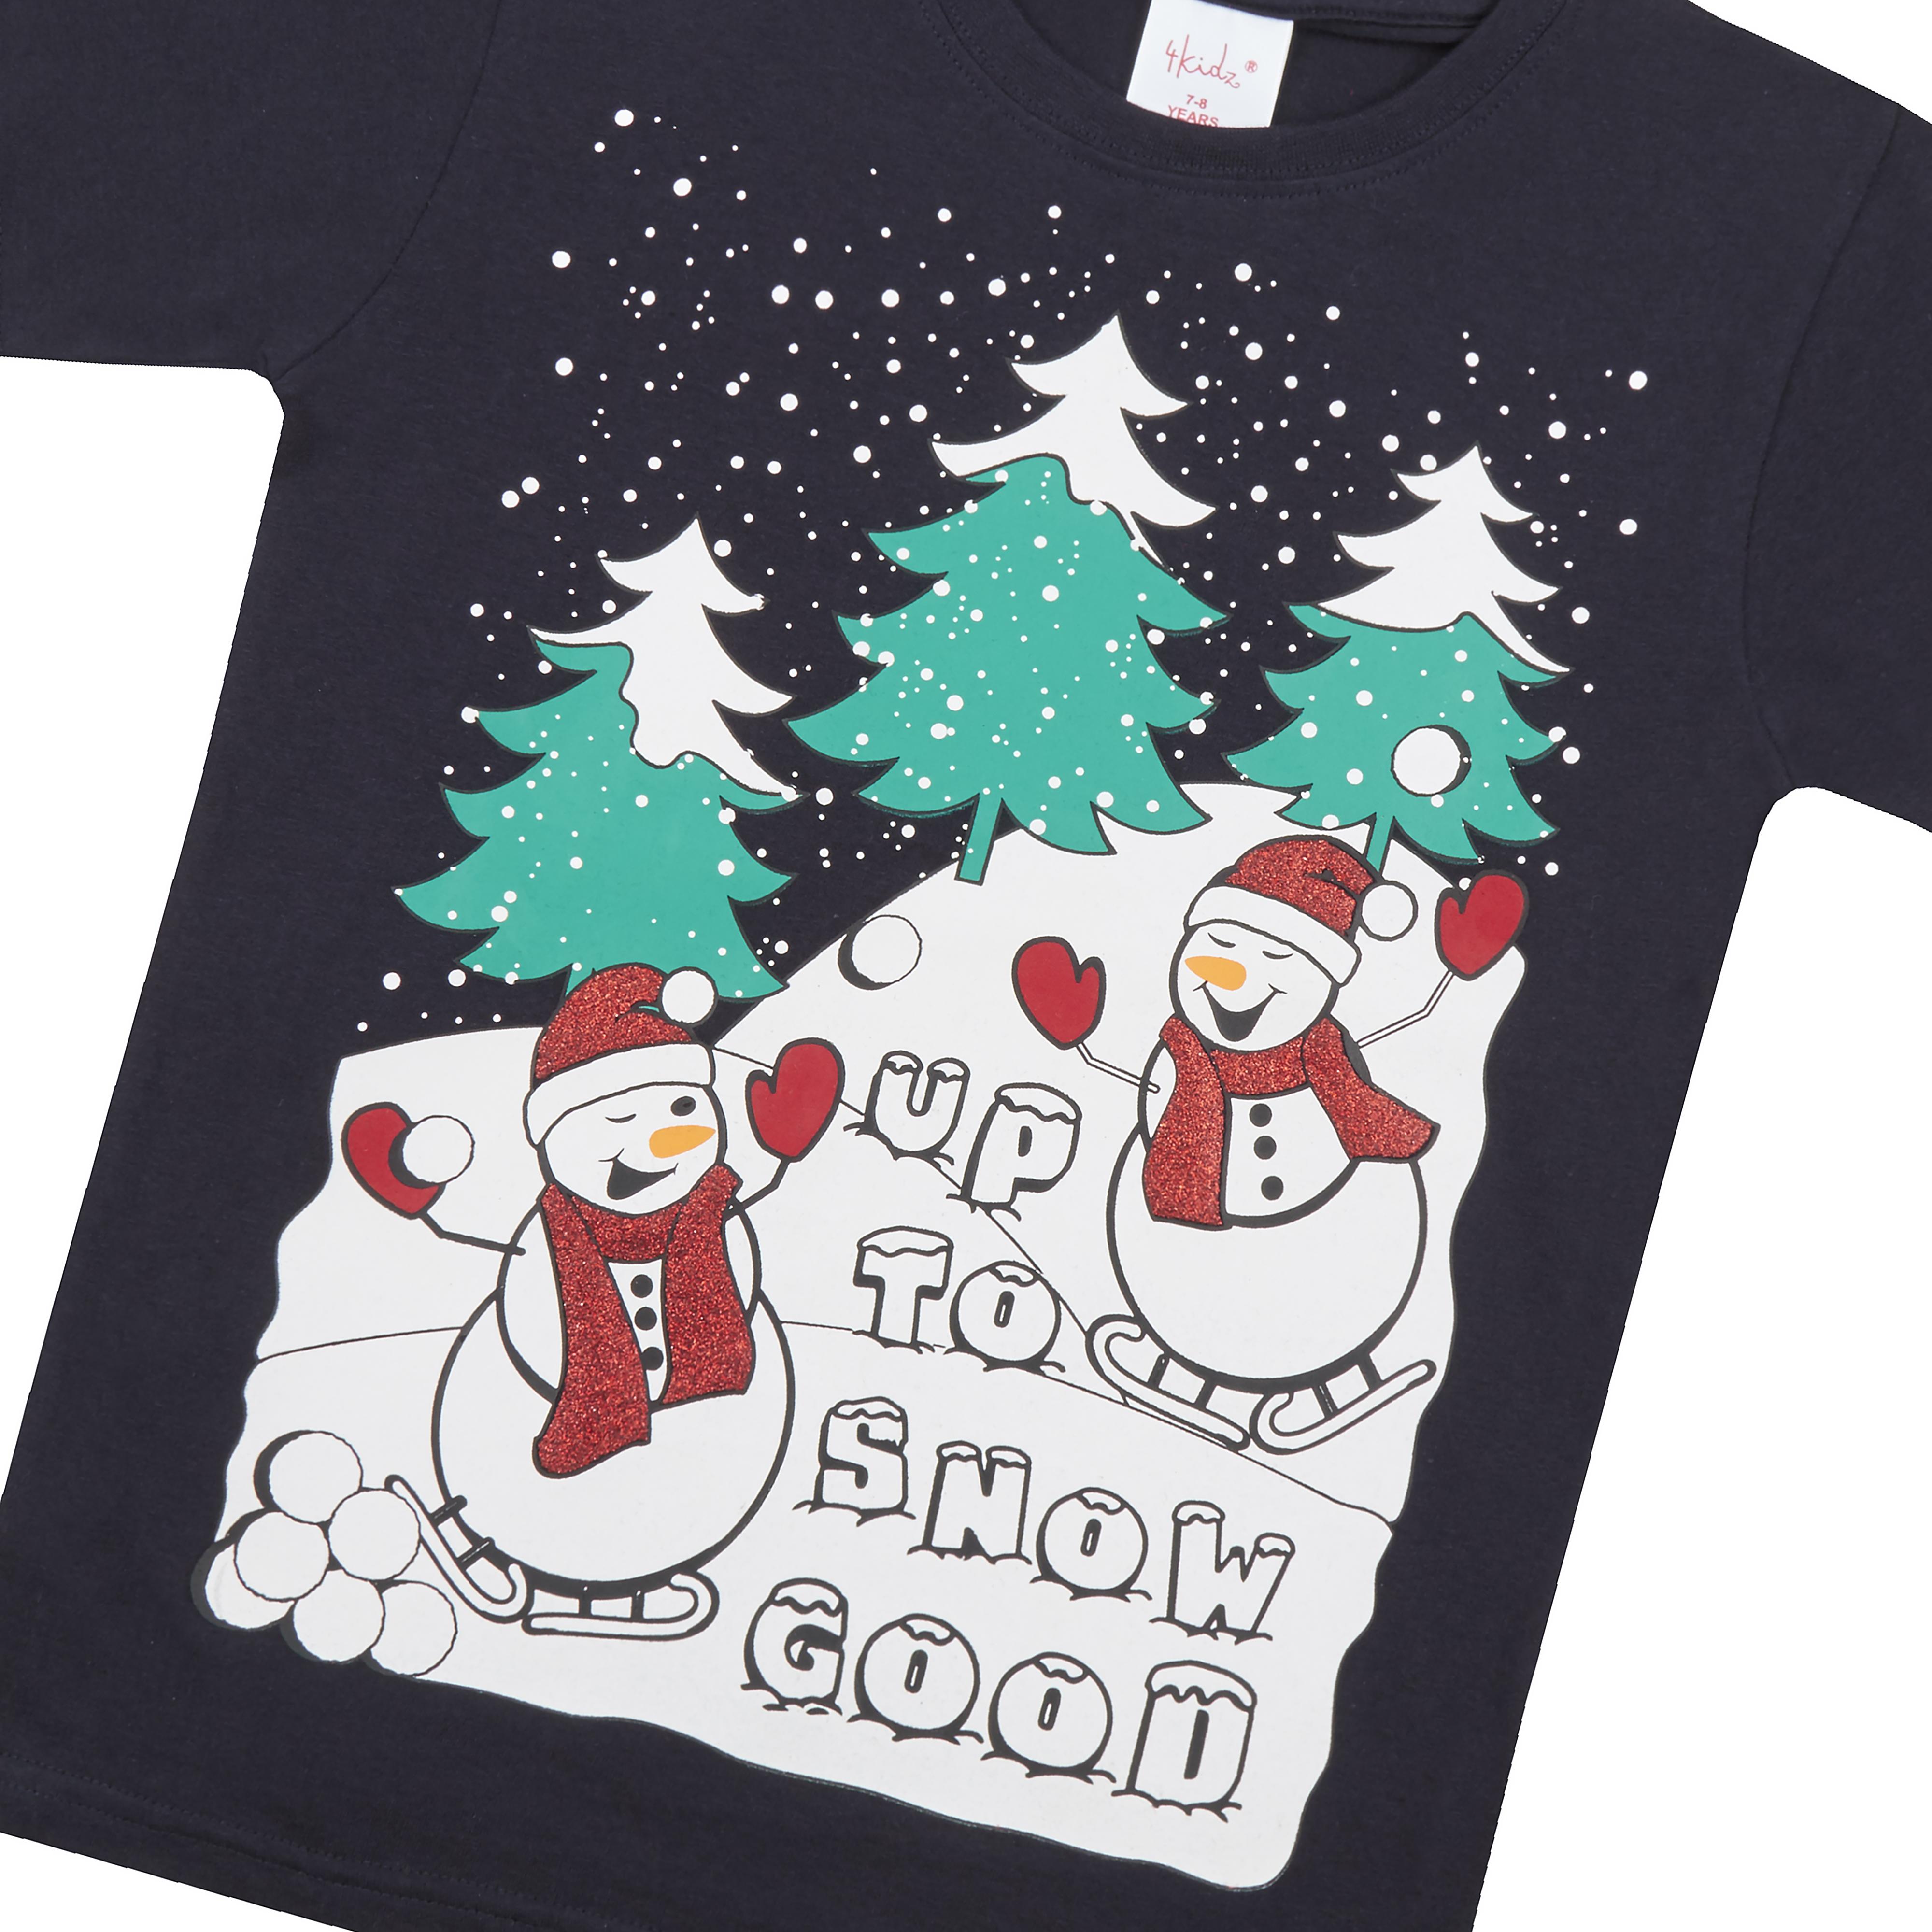 Childrens-Girls-Boys-Xmas-T-Shirts-Printed-Christmas-Design-100-Cotton-2-13-Yrs thumbnail 28